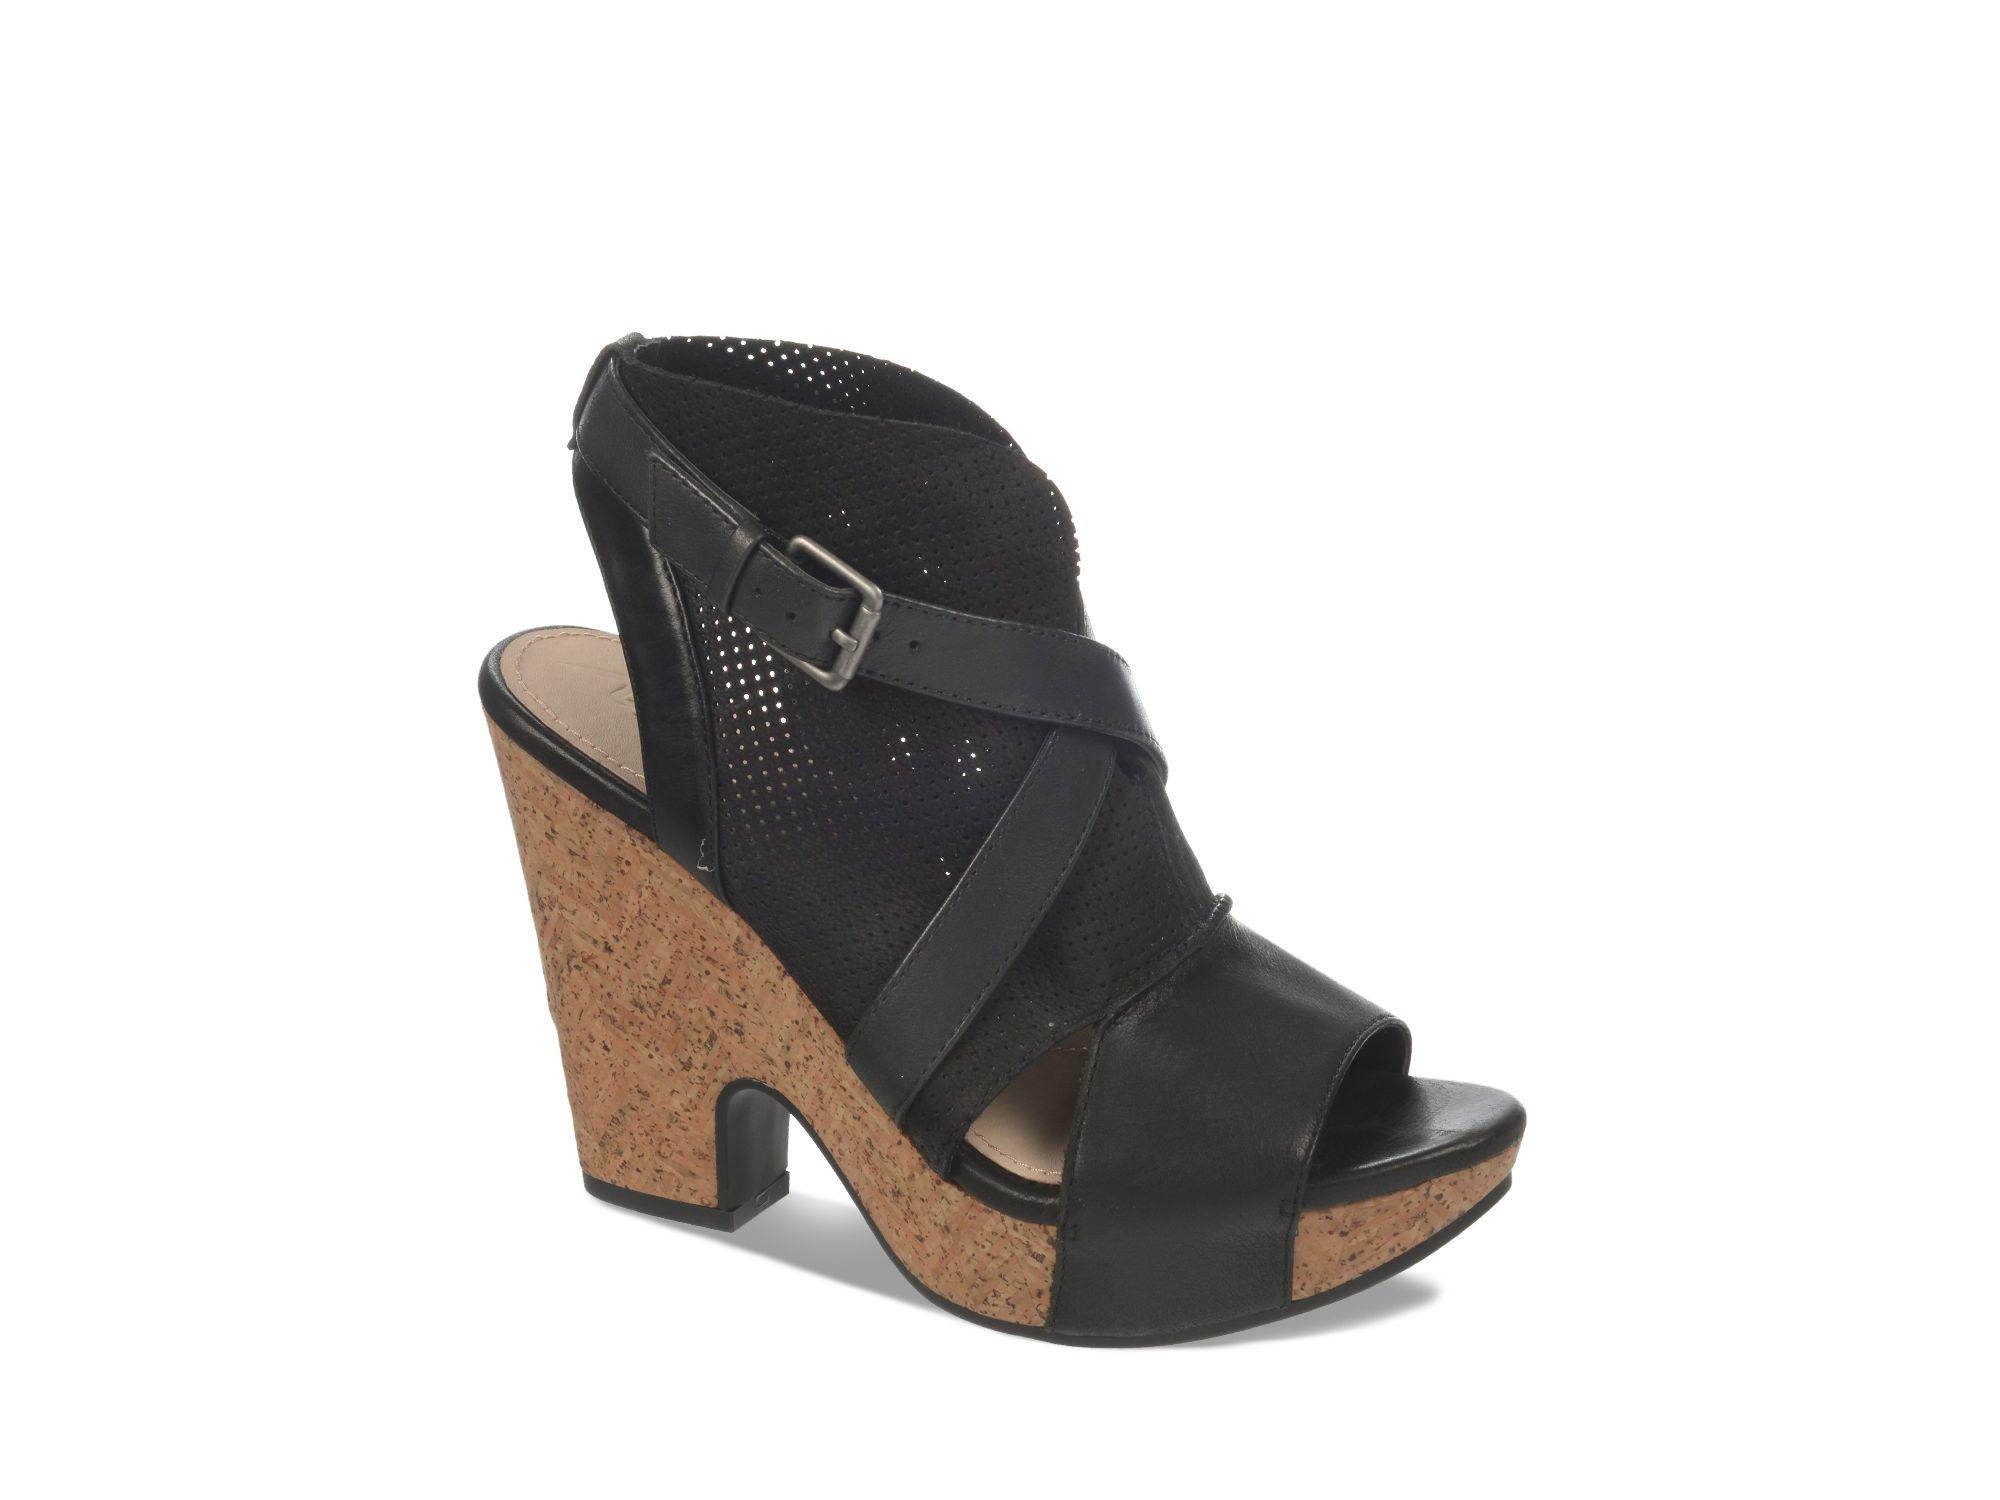 naya open toe platform sandals maple in black lyst